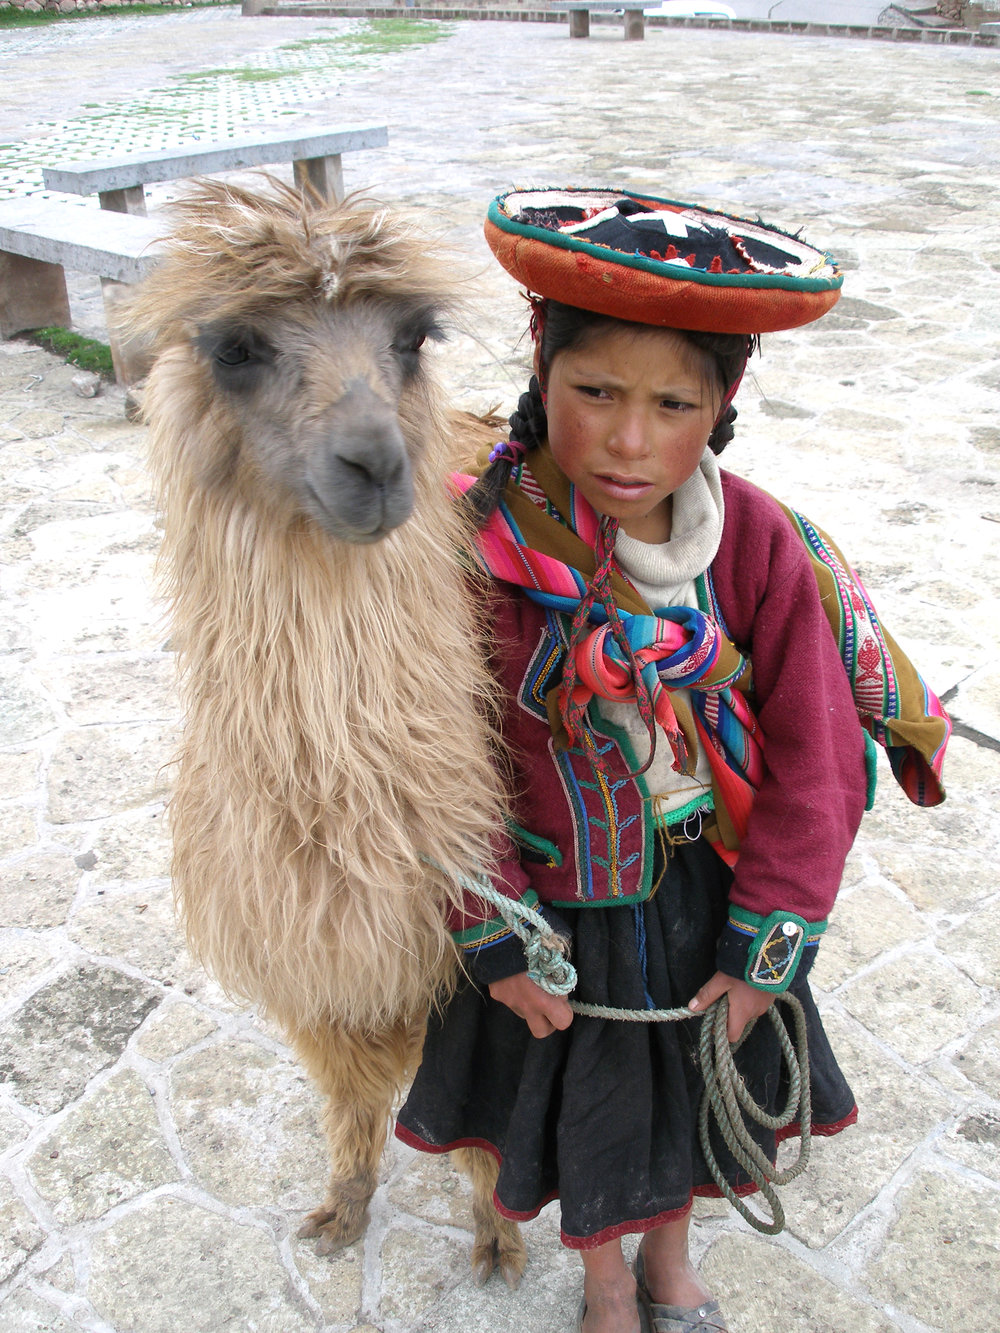 A_Quechua_girl_and_her_Llama.jpg